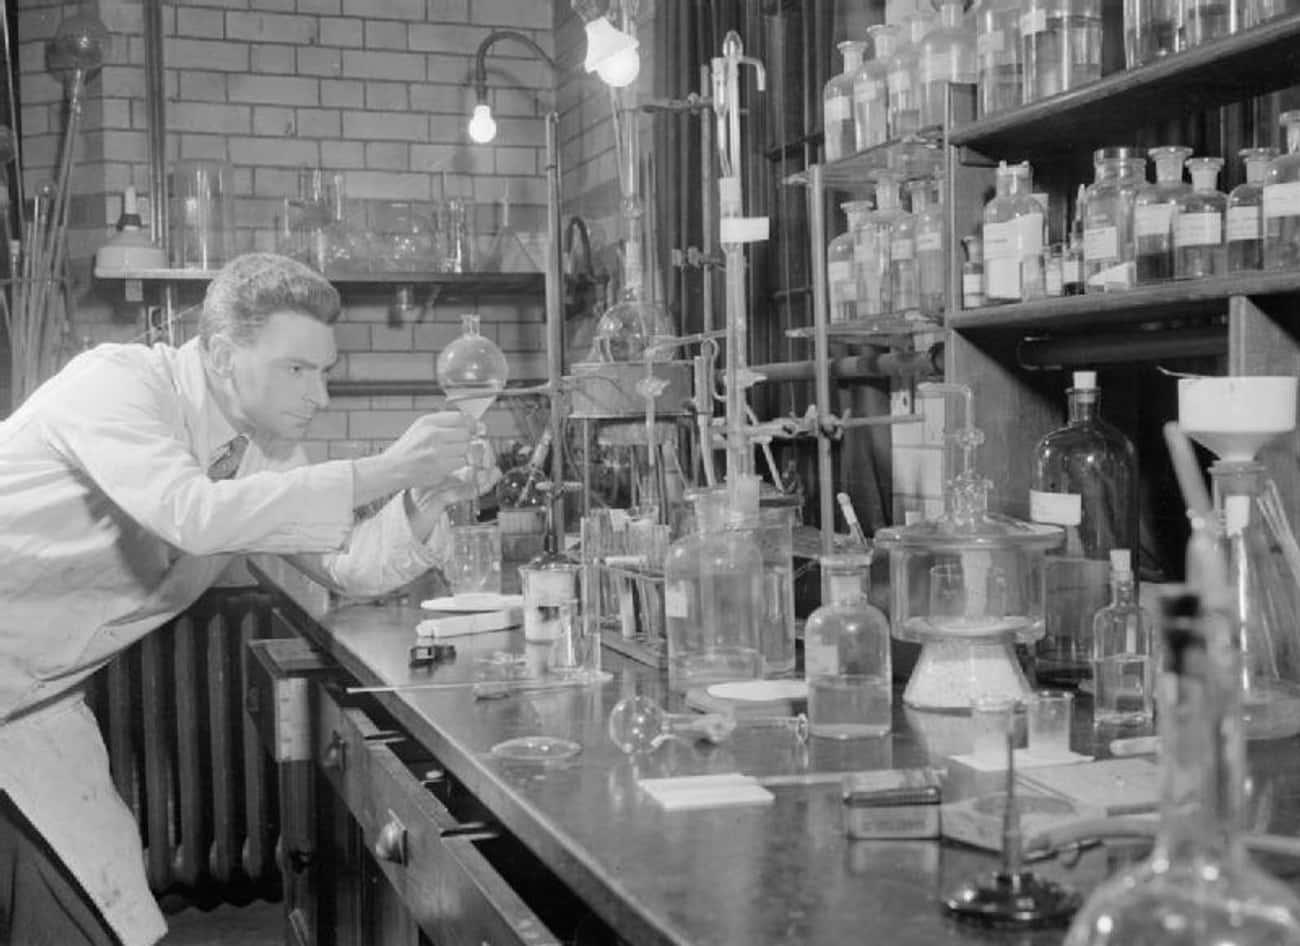 A Lab Tech Accidentally Grew Penicillin In A Contaminated Bacteria Culture